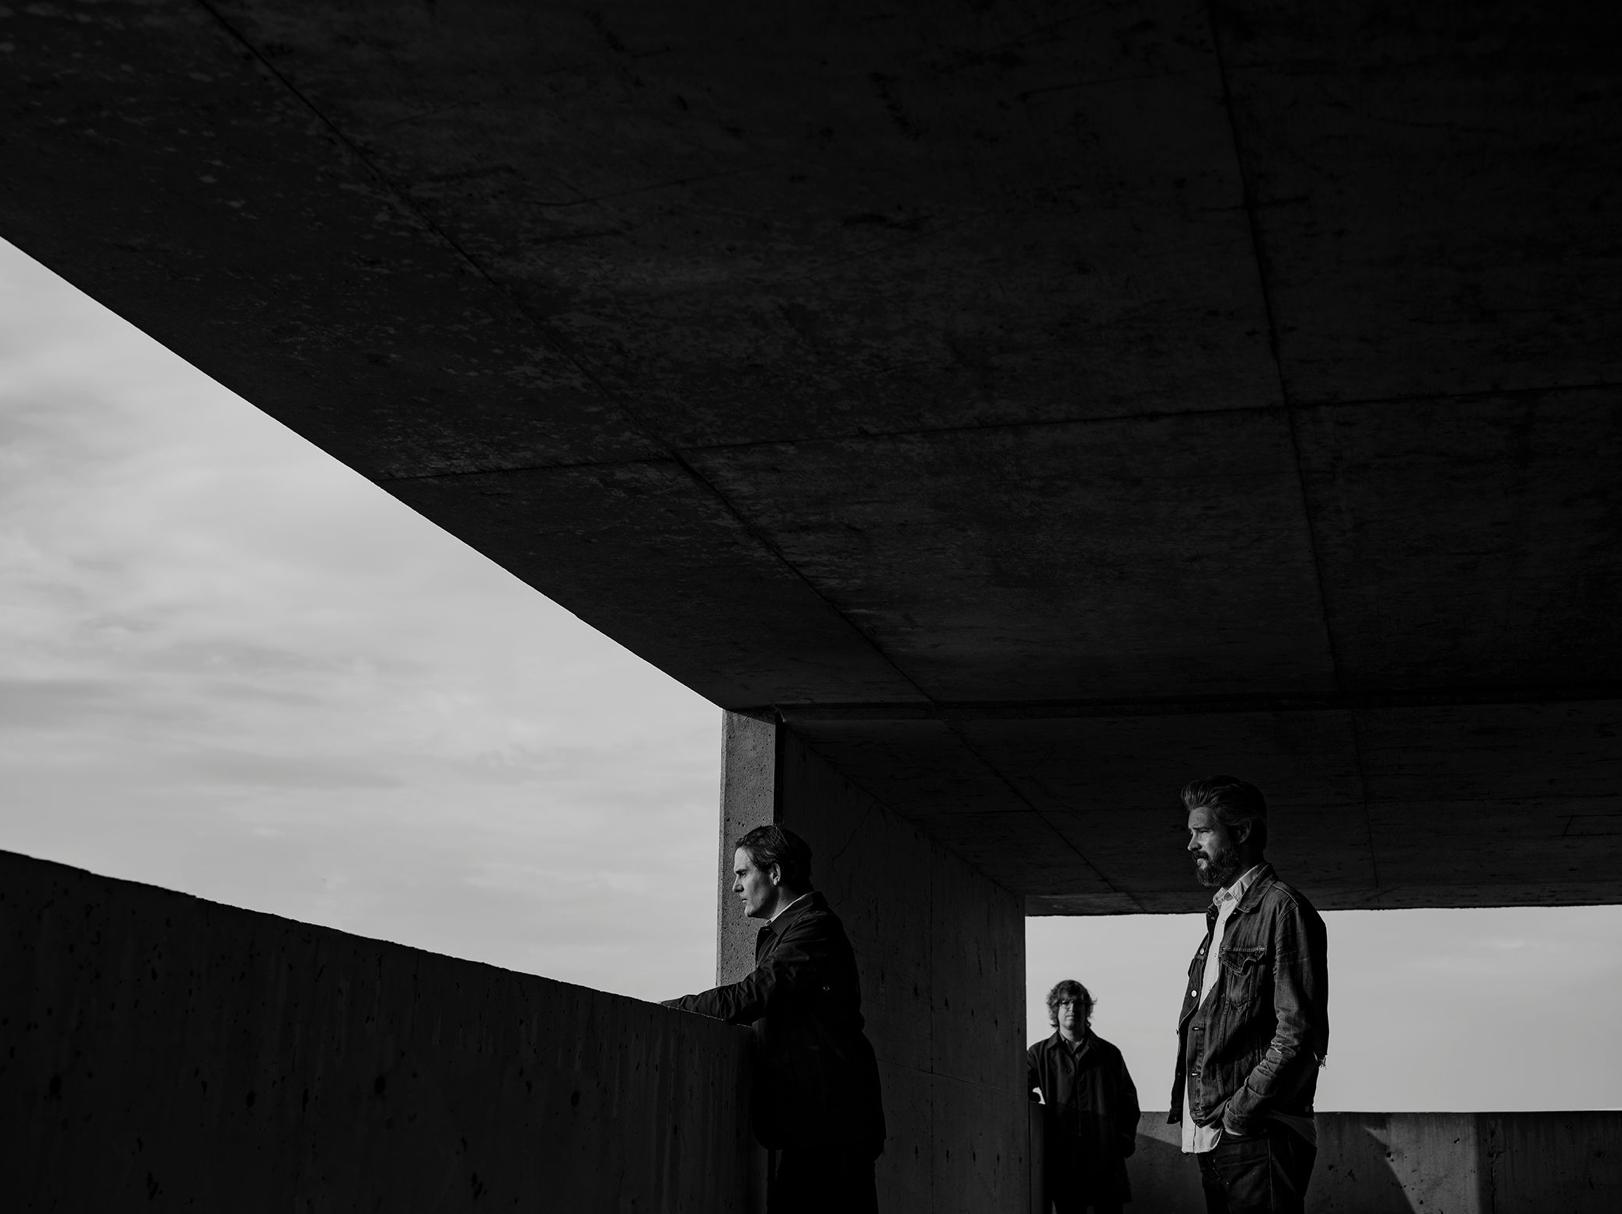 Un nouvel album de Metz